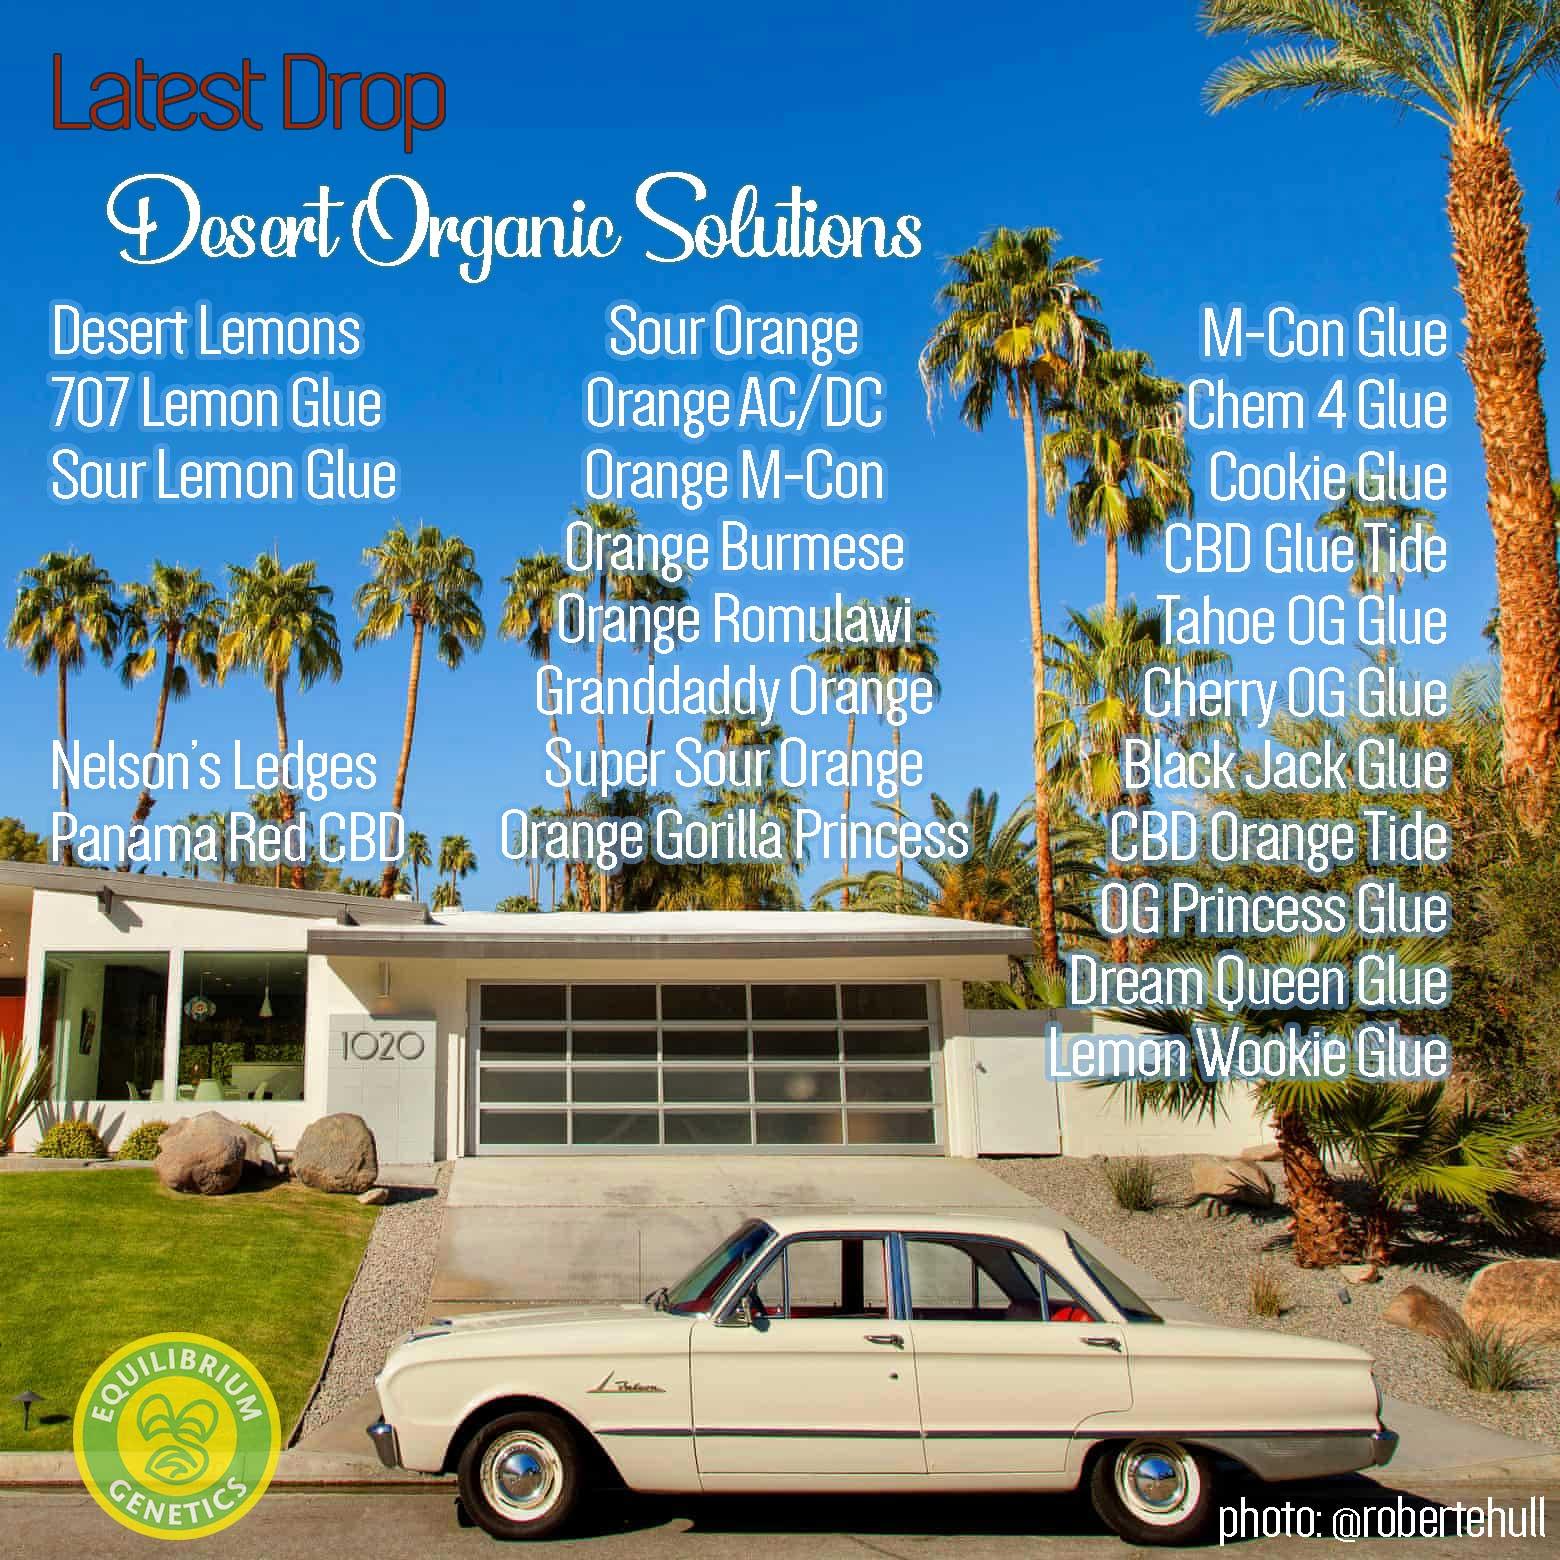 Latest Drop: Desert Organic Solutions